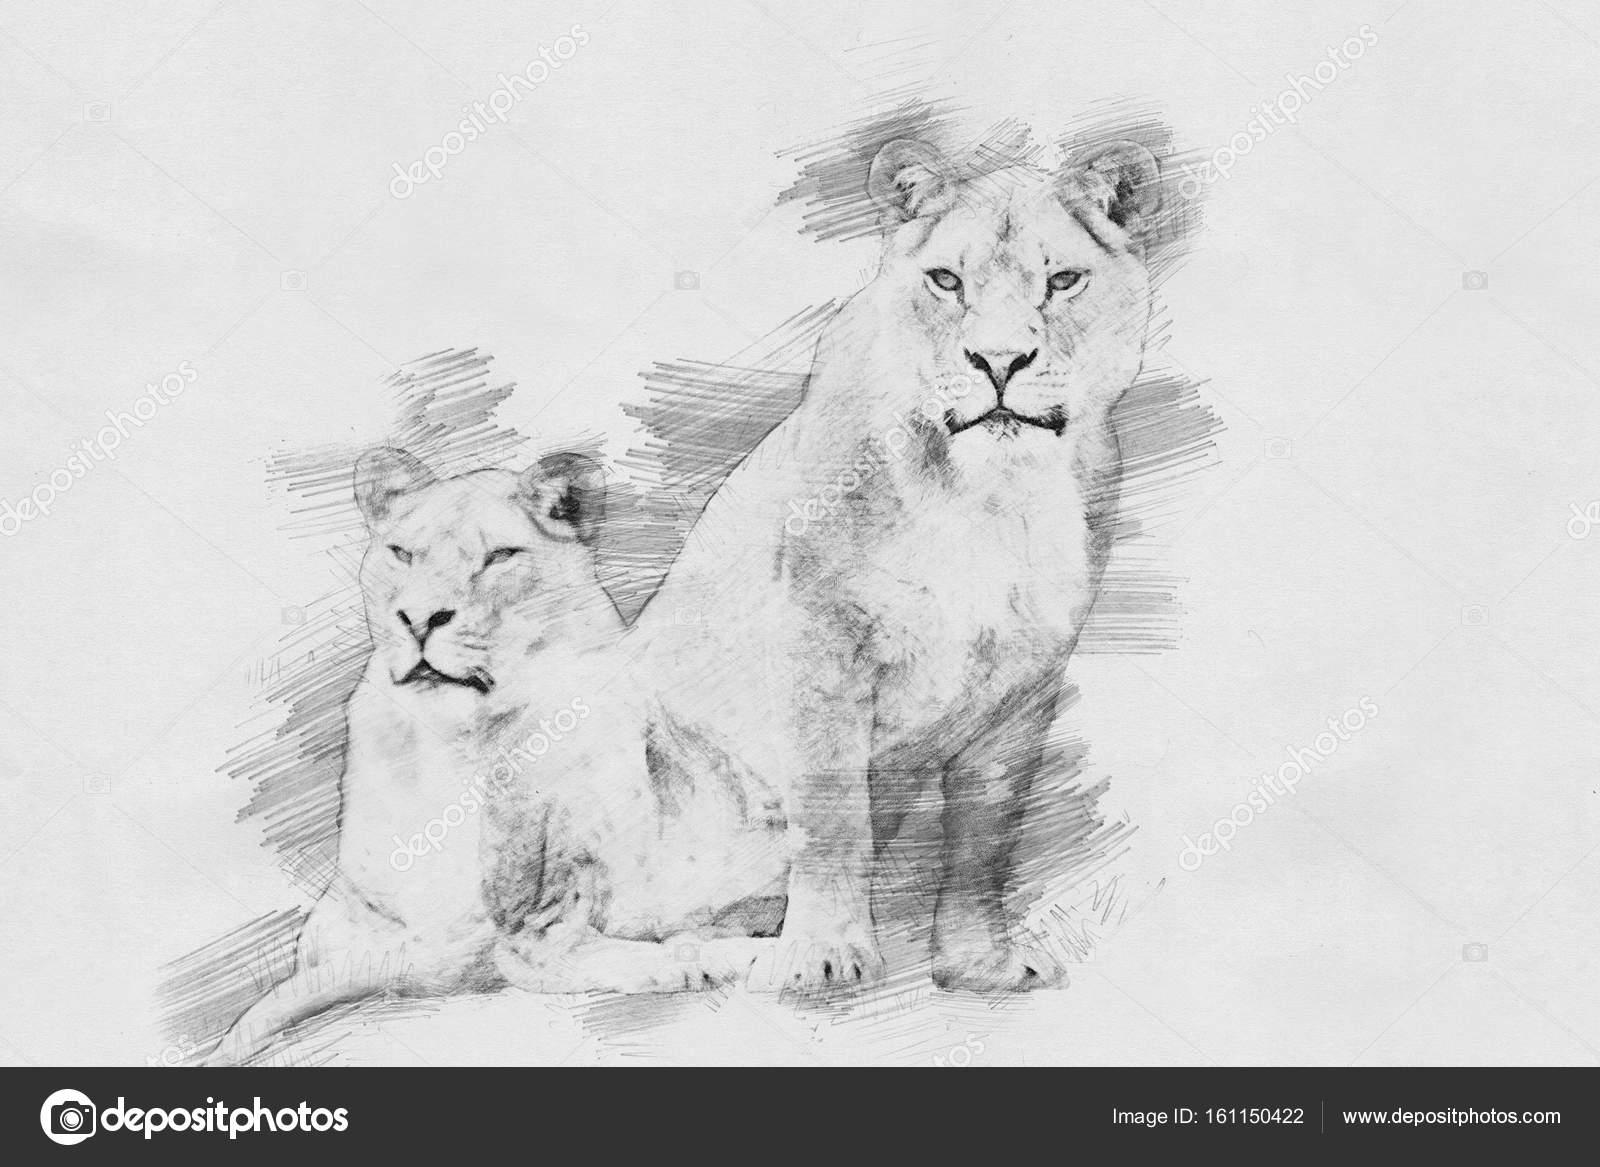 Line Art Lion : Lion sketch with pencil u stock photo volodymyrbur